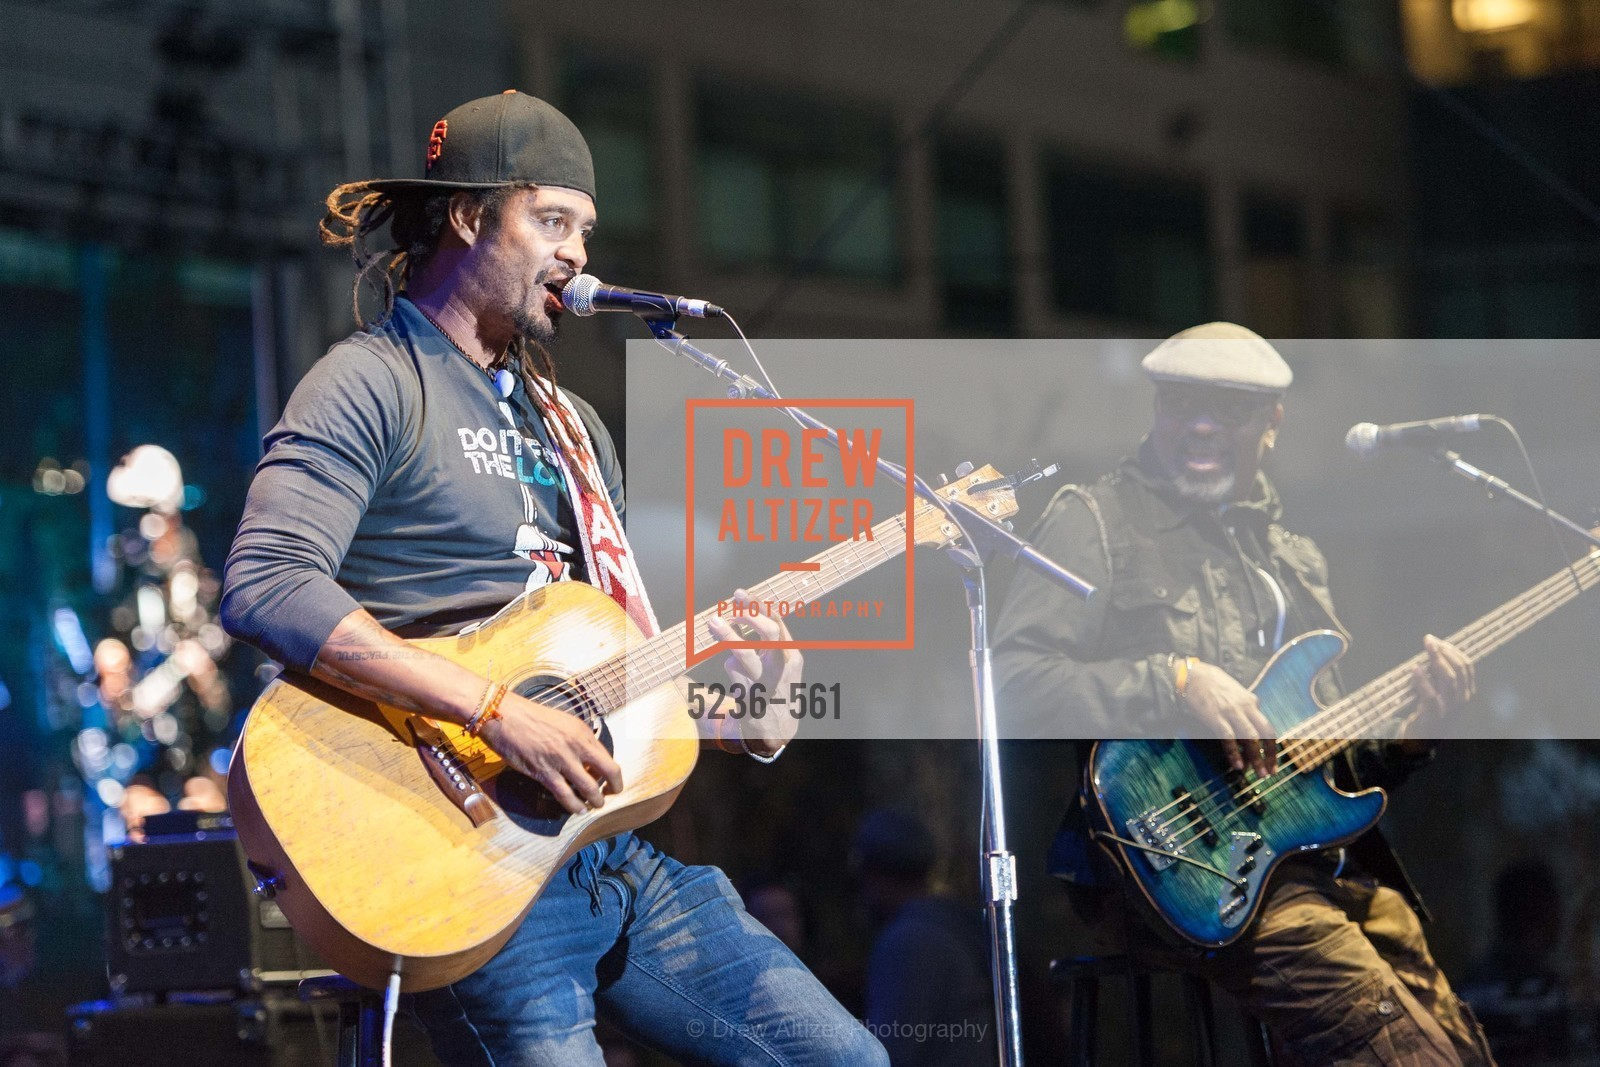 Performance By Michael Franti, Photo #5236-561